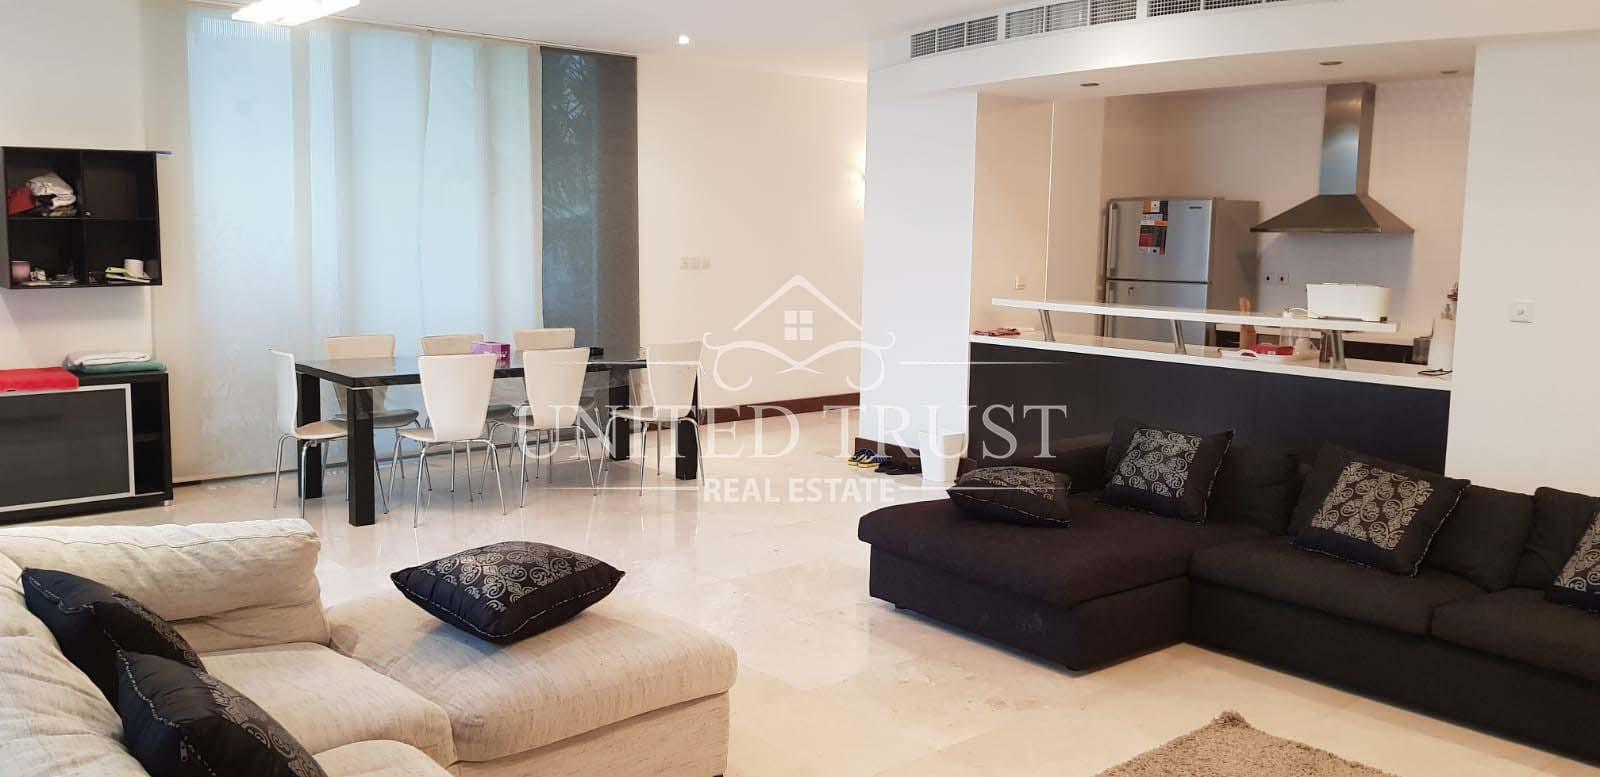 For sale villa in durrat Bahrain jetty/pool.very prime location Ref: DUR-AB-004